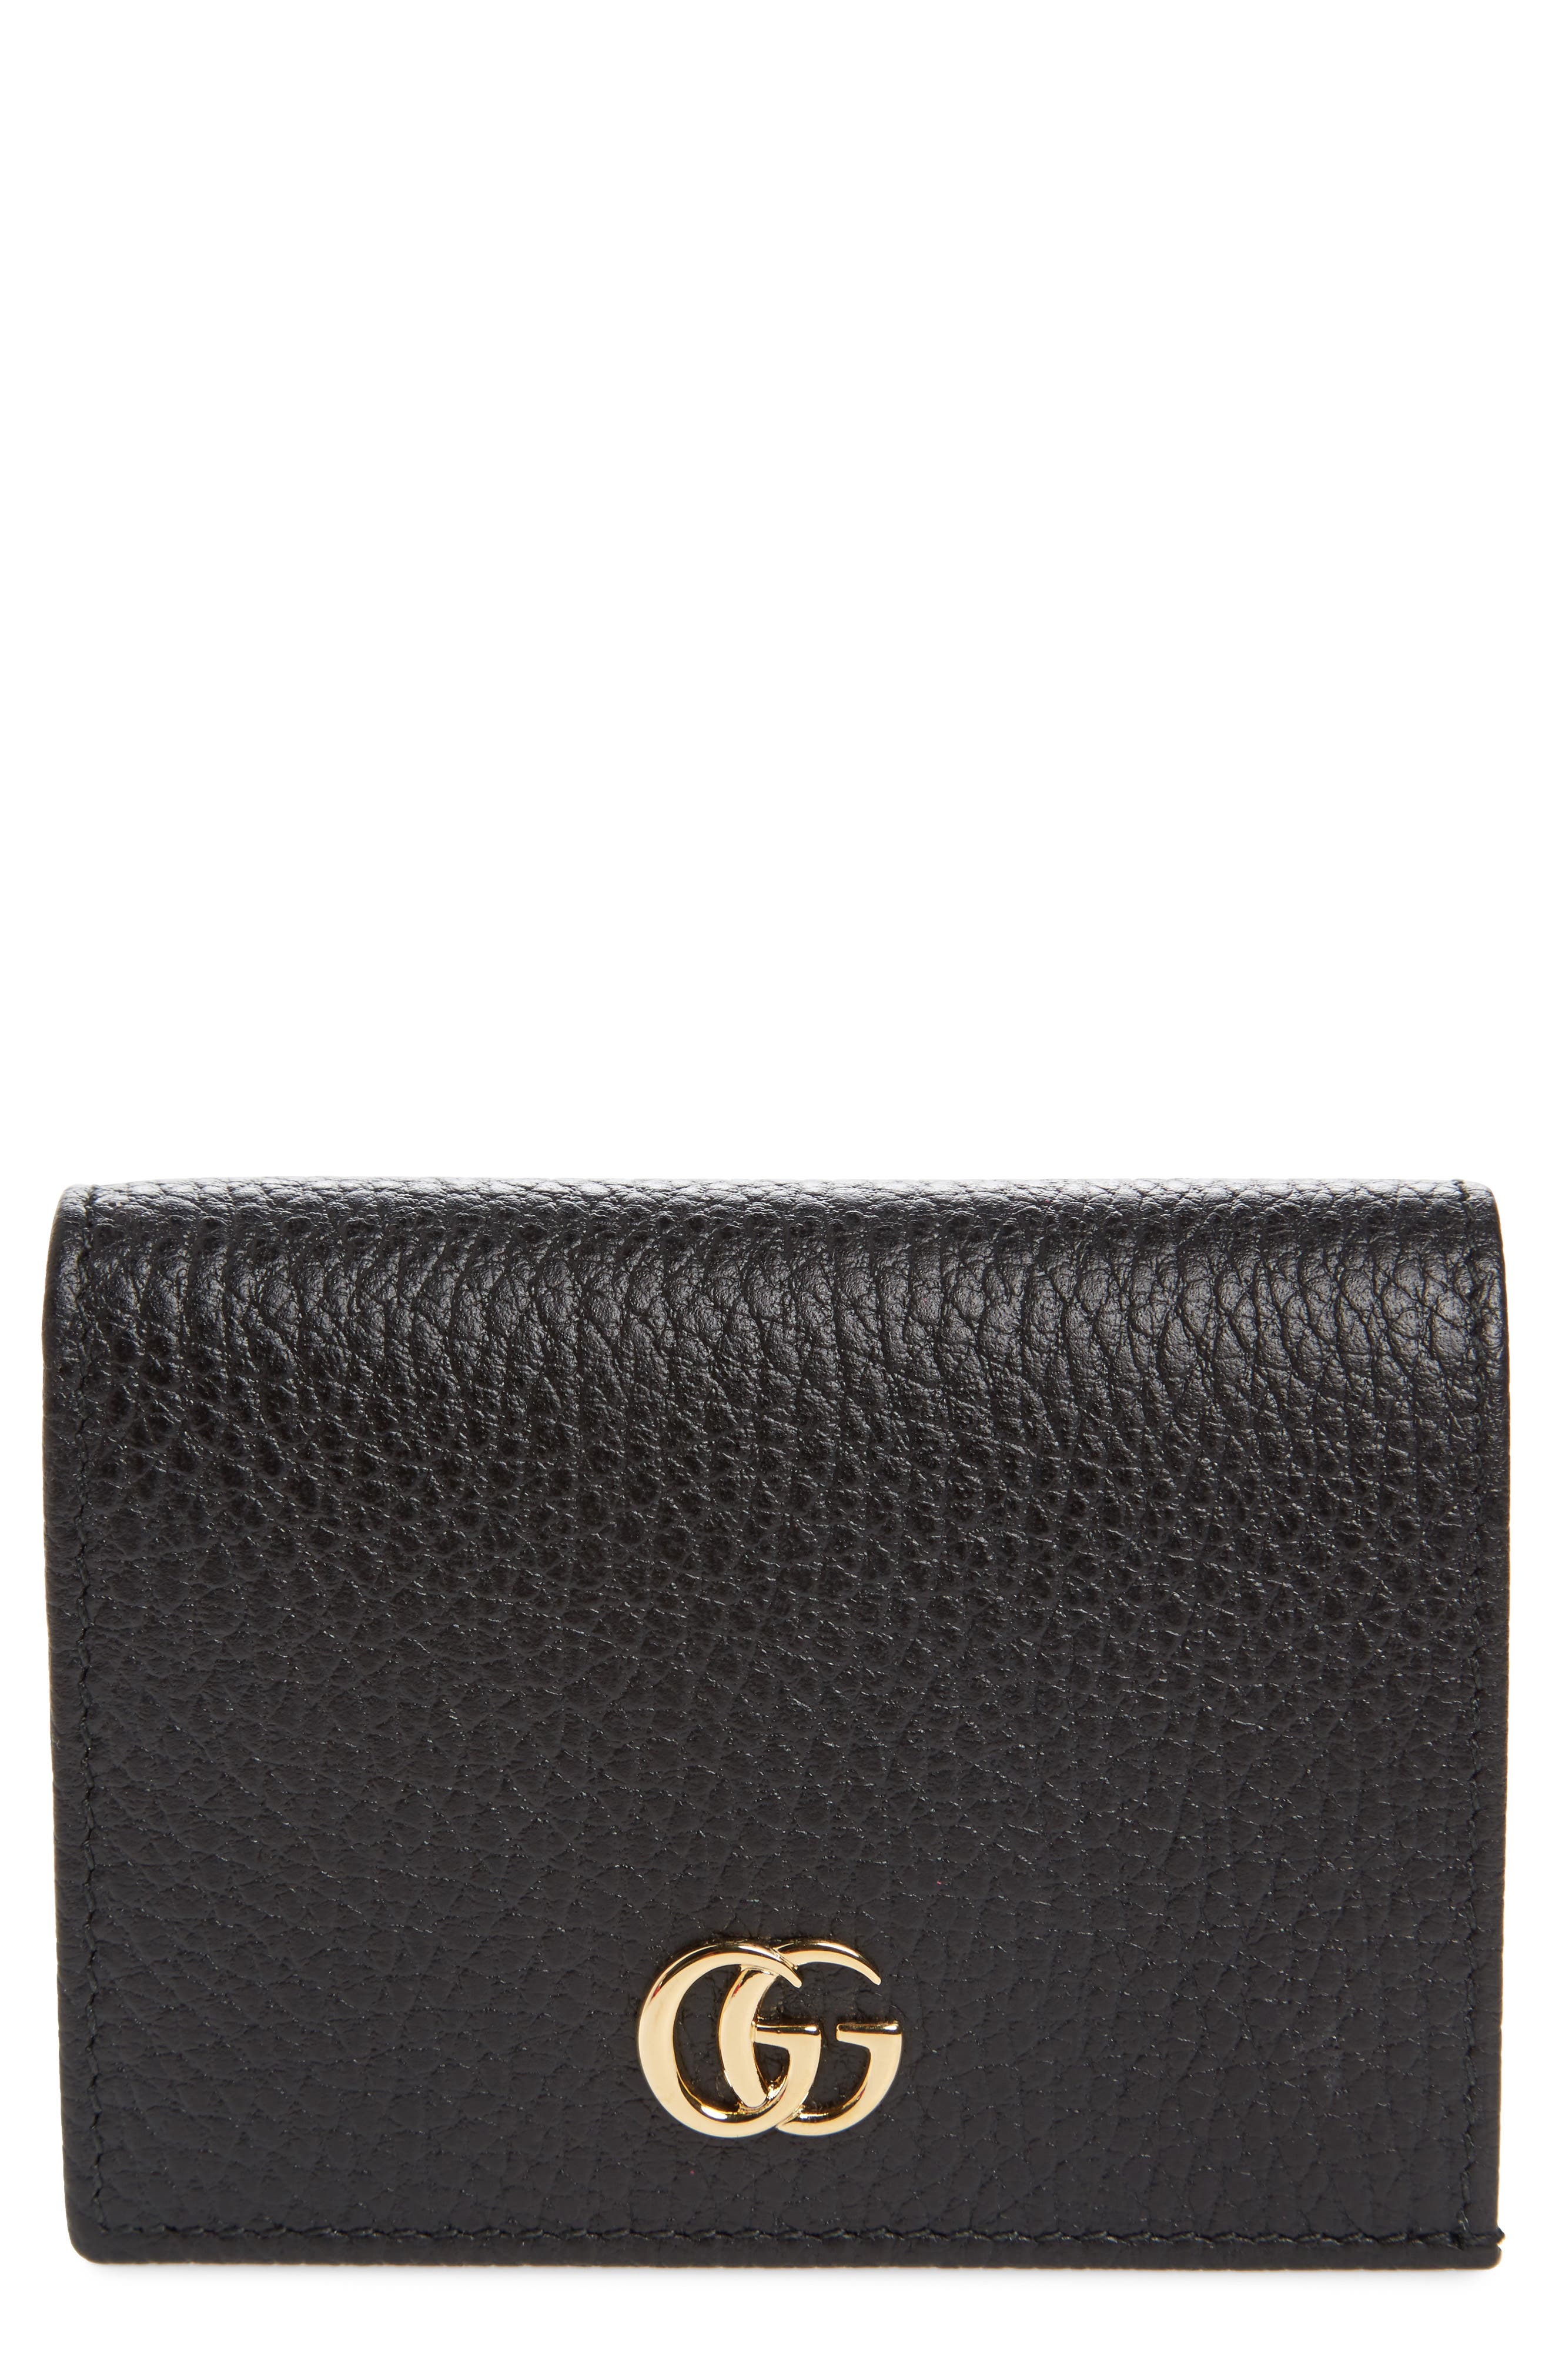 Petite Marmont Leather Card Case,                             Main thumbnail 1, color,                             Nero/ Nero